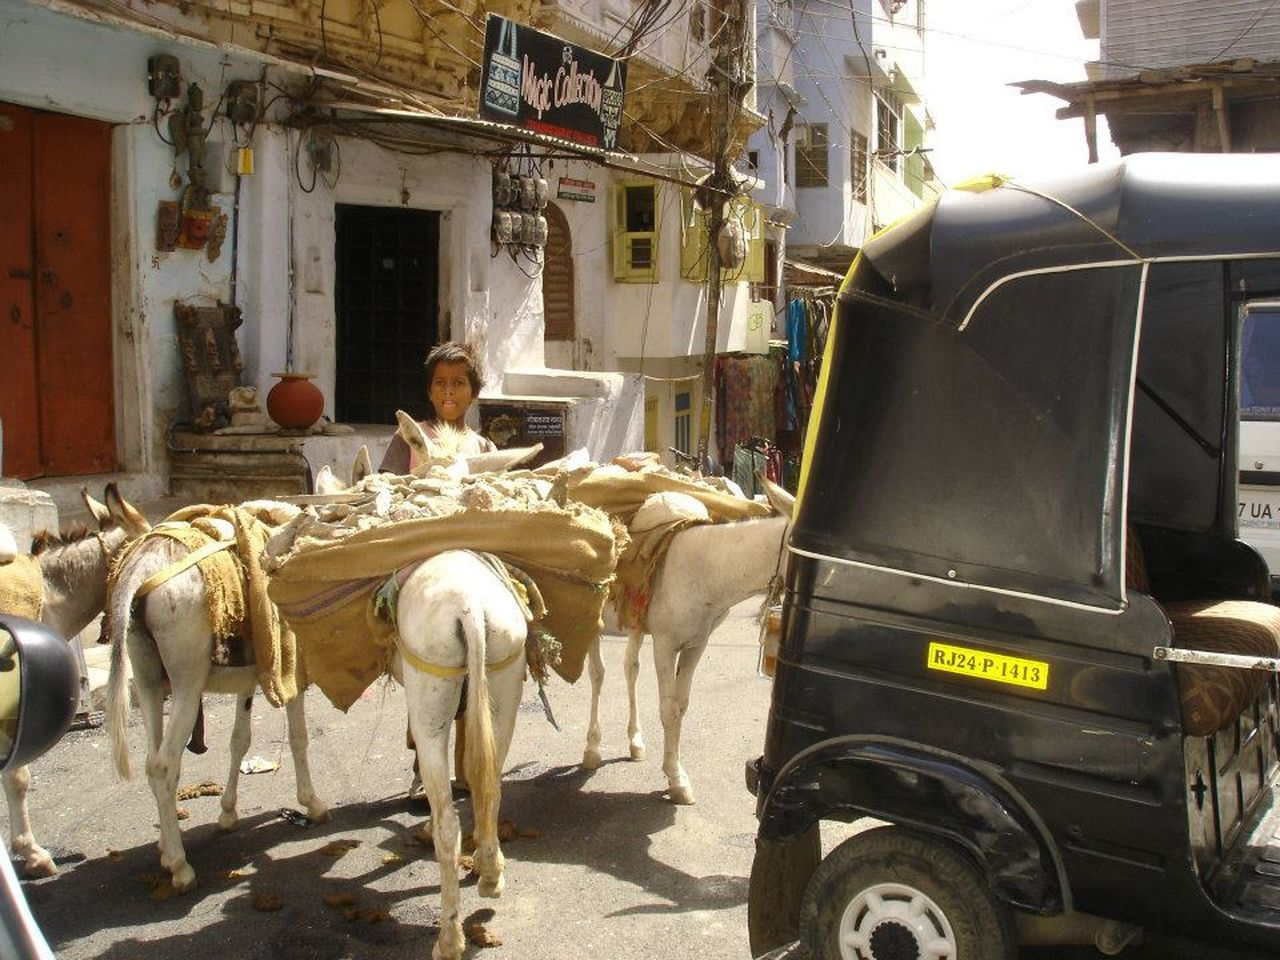 India Indiapictures Rickshaw Udaipur Indialife Beautifulindia Culture Of India